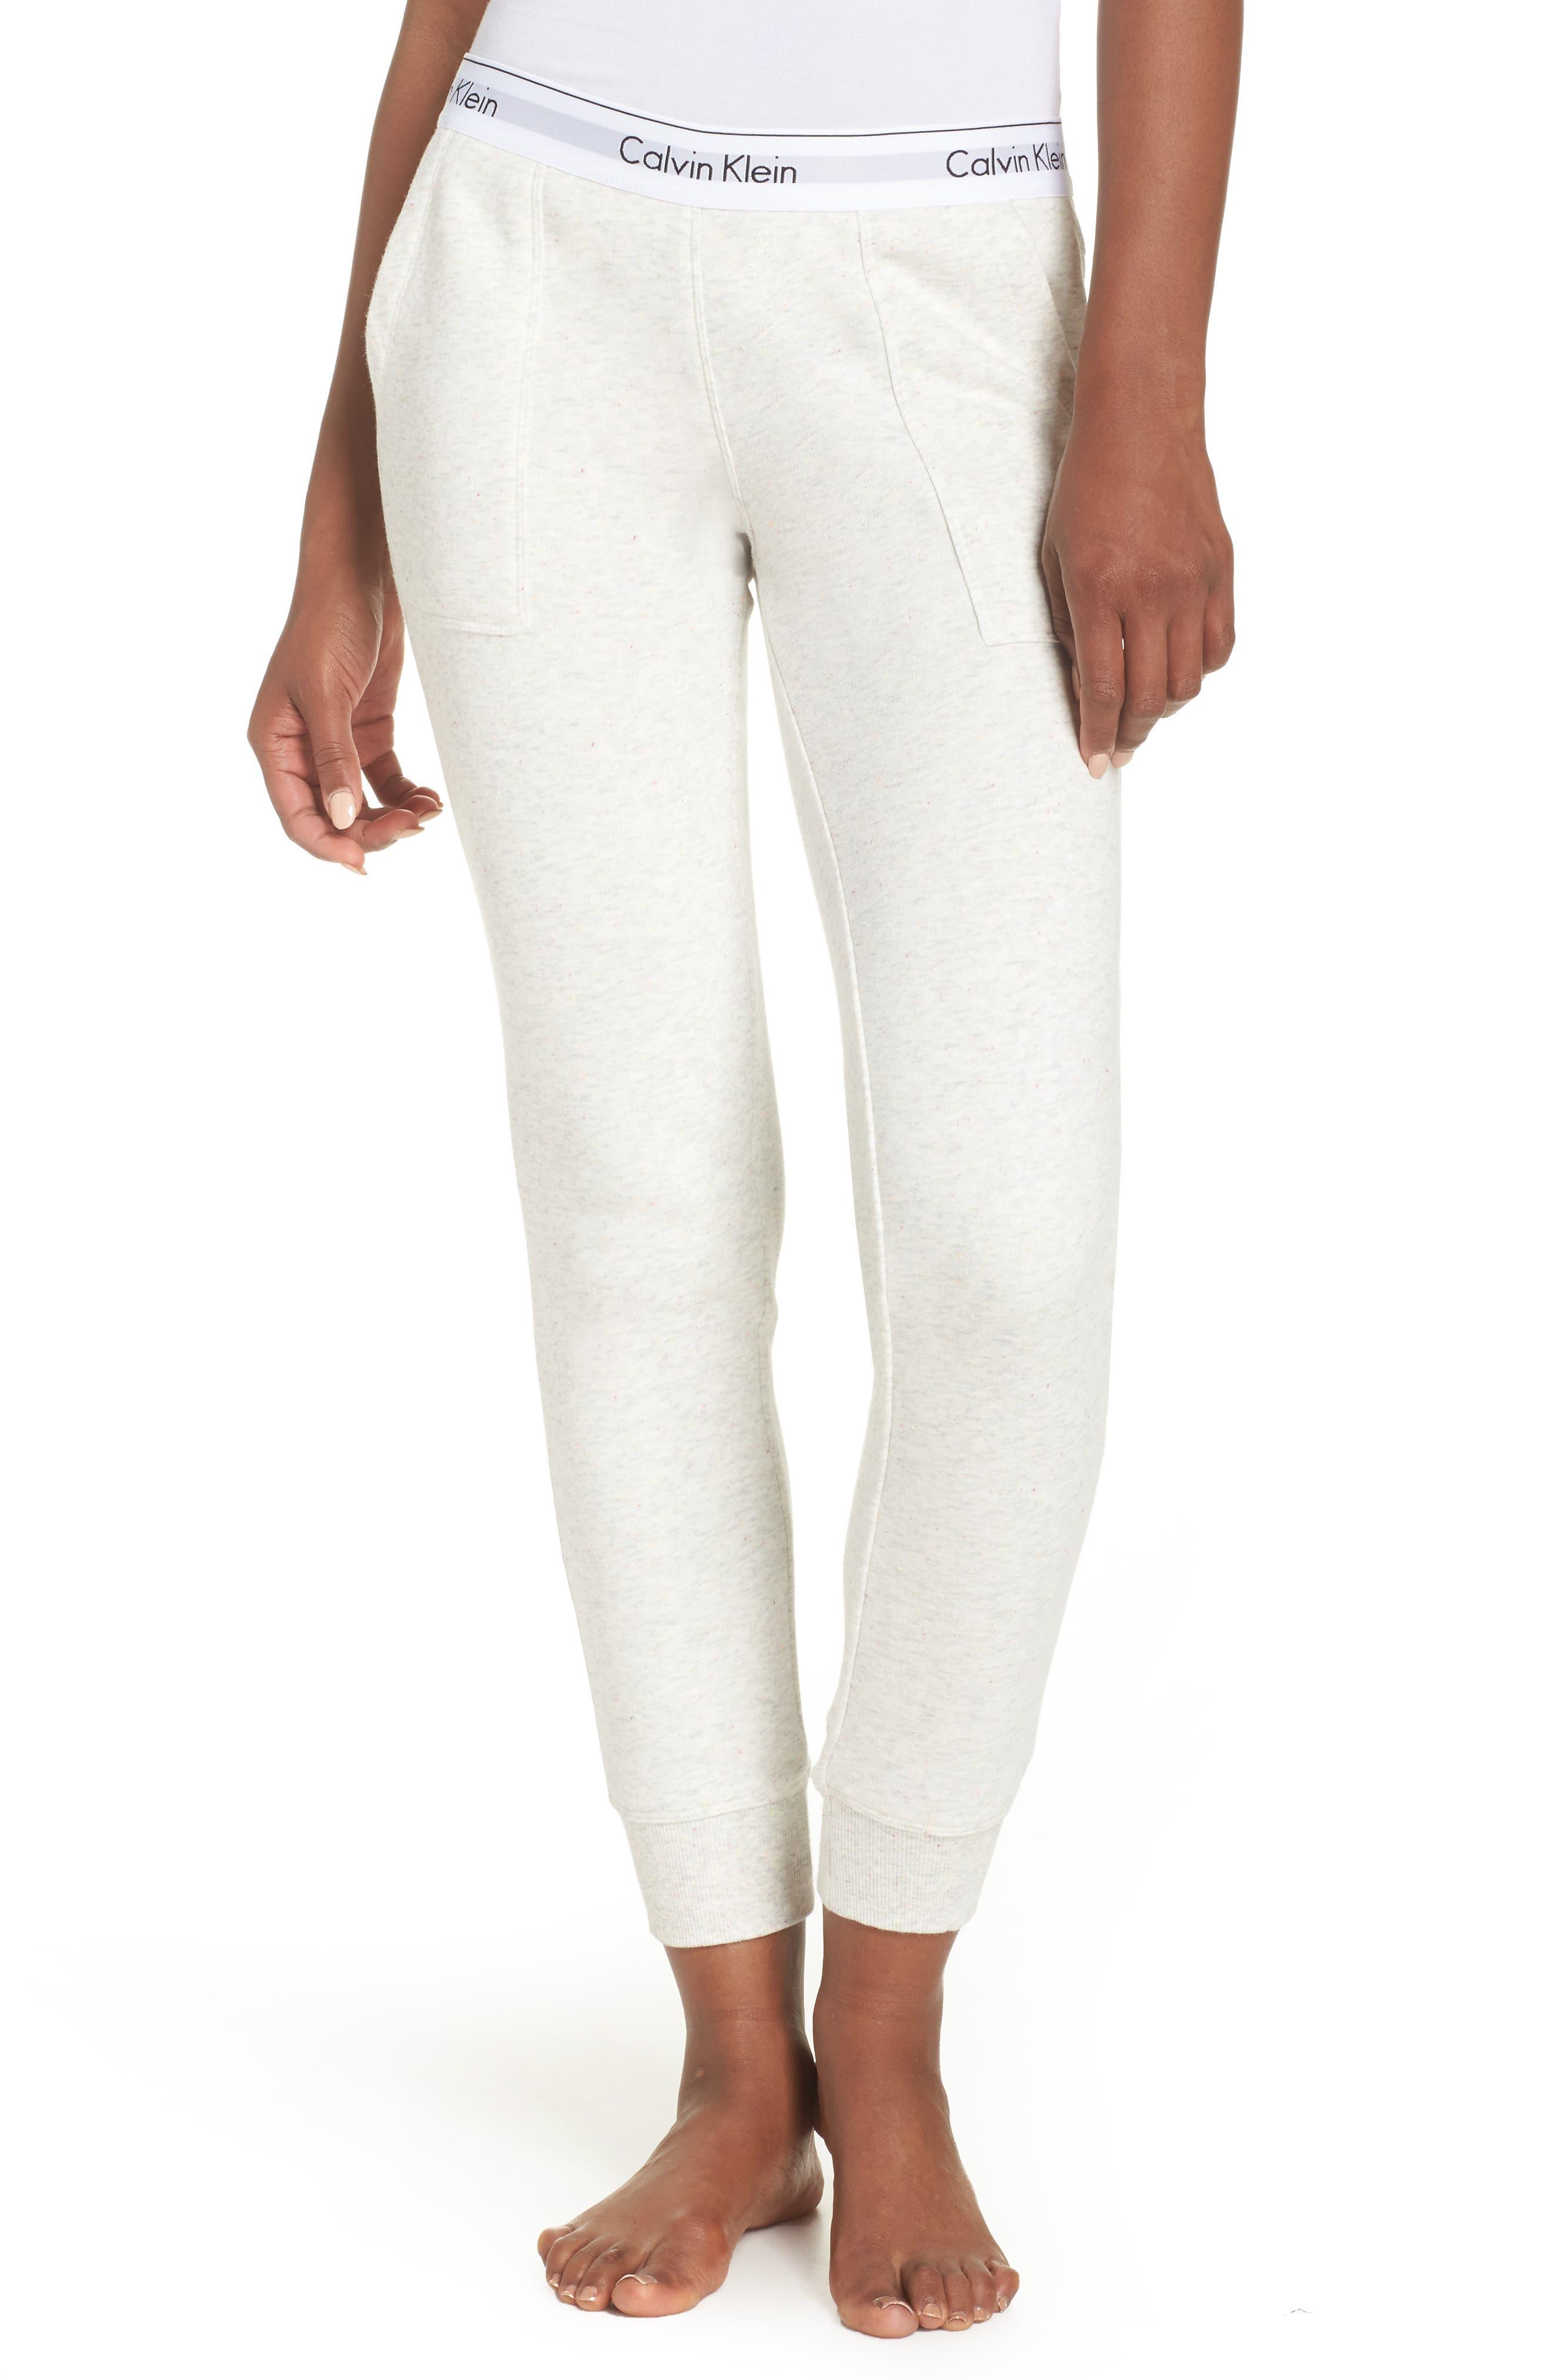 Calvin Klein Lounge Jogger Pants